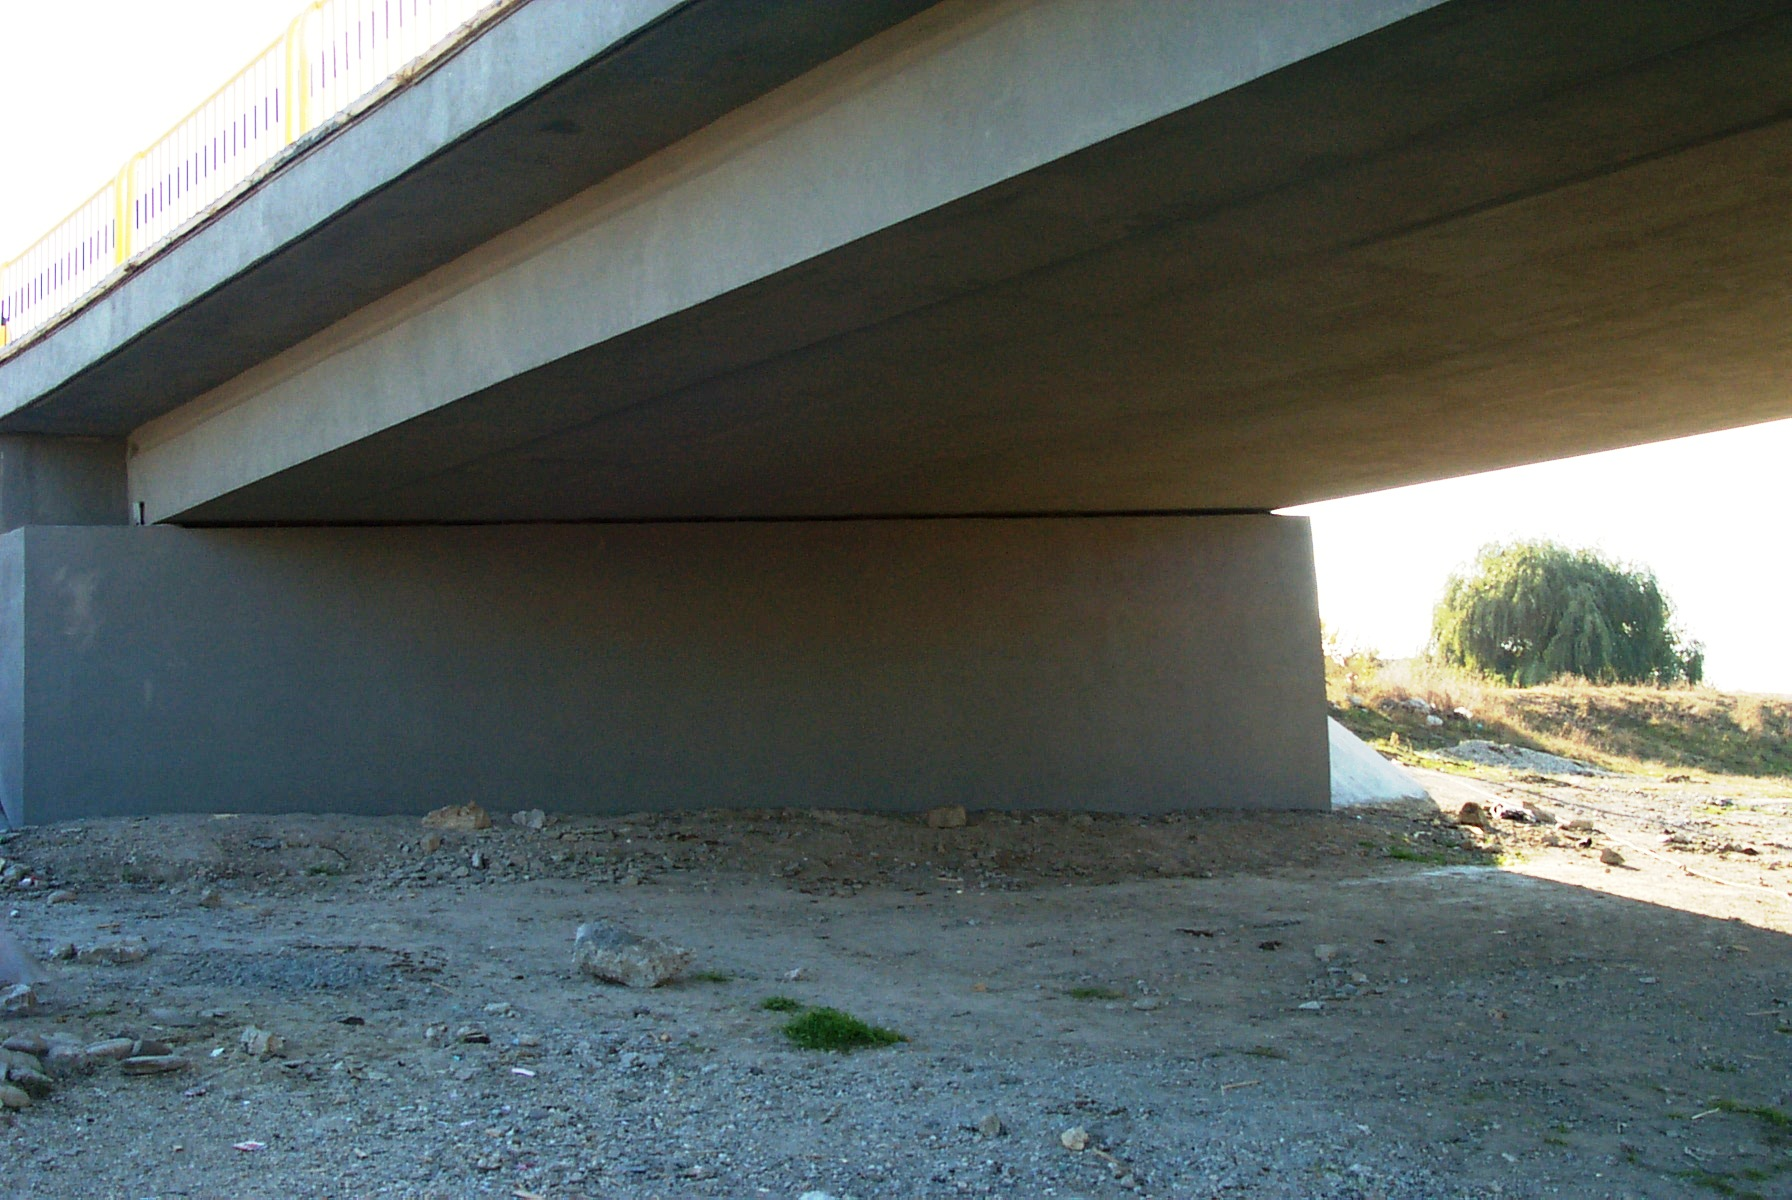 Reparatii pod (DN2), Km. 33 - 028, peste raul Calnistea MAPEI - Poza 125